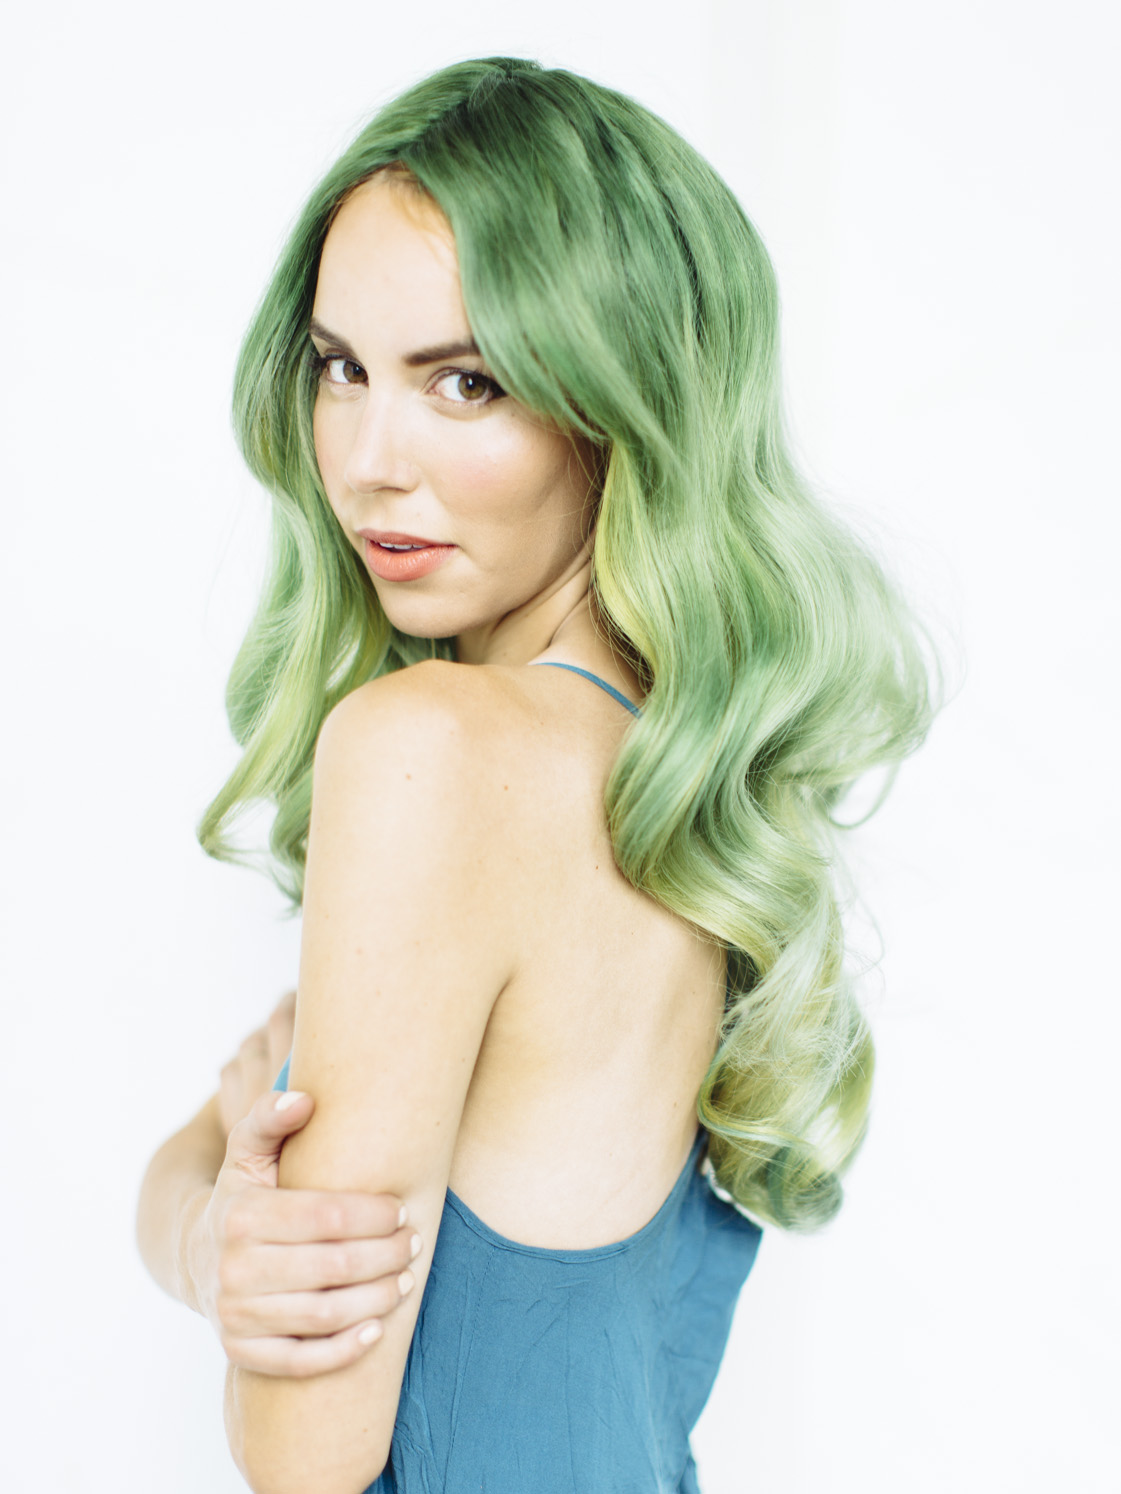 Aubrey Nelson, hair painter